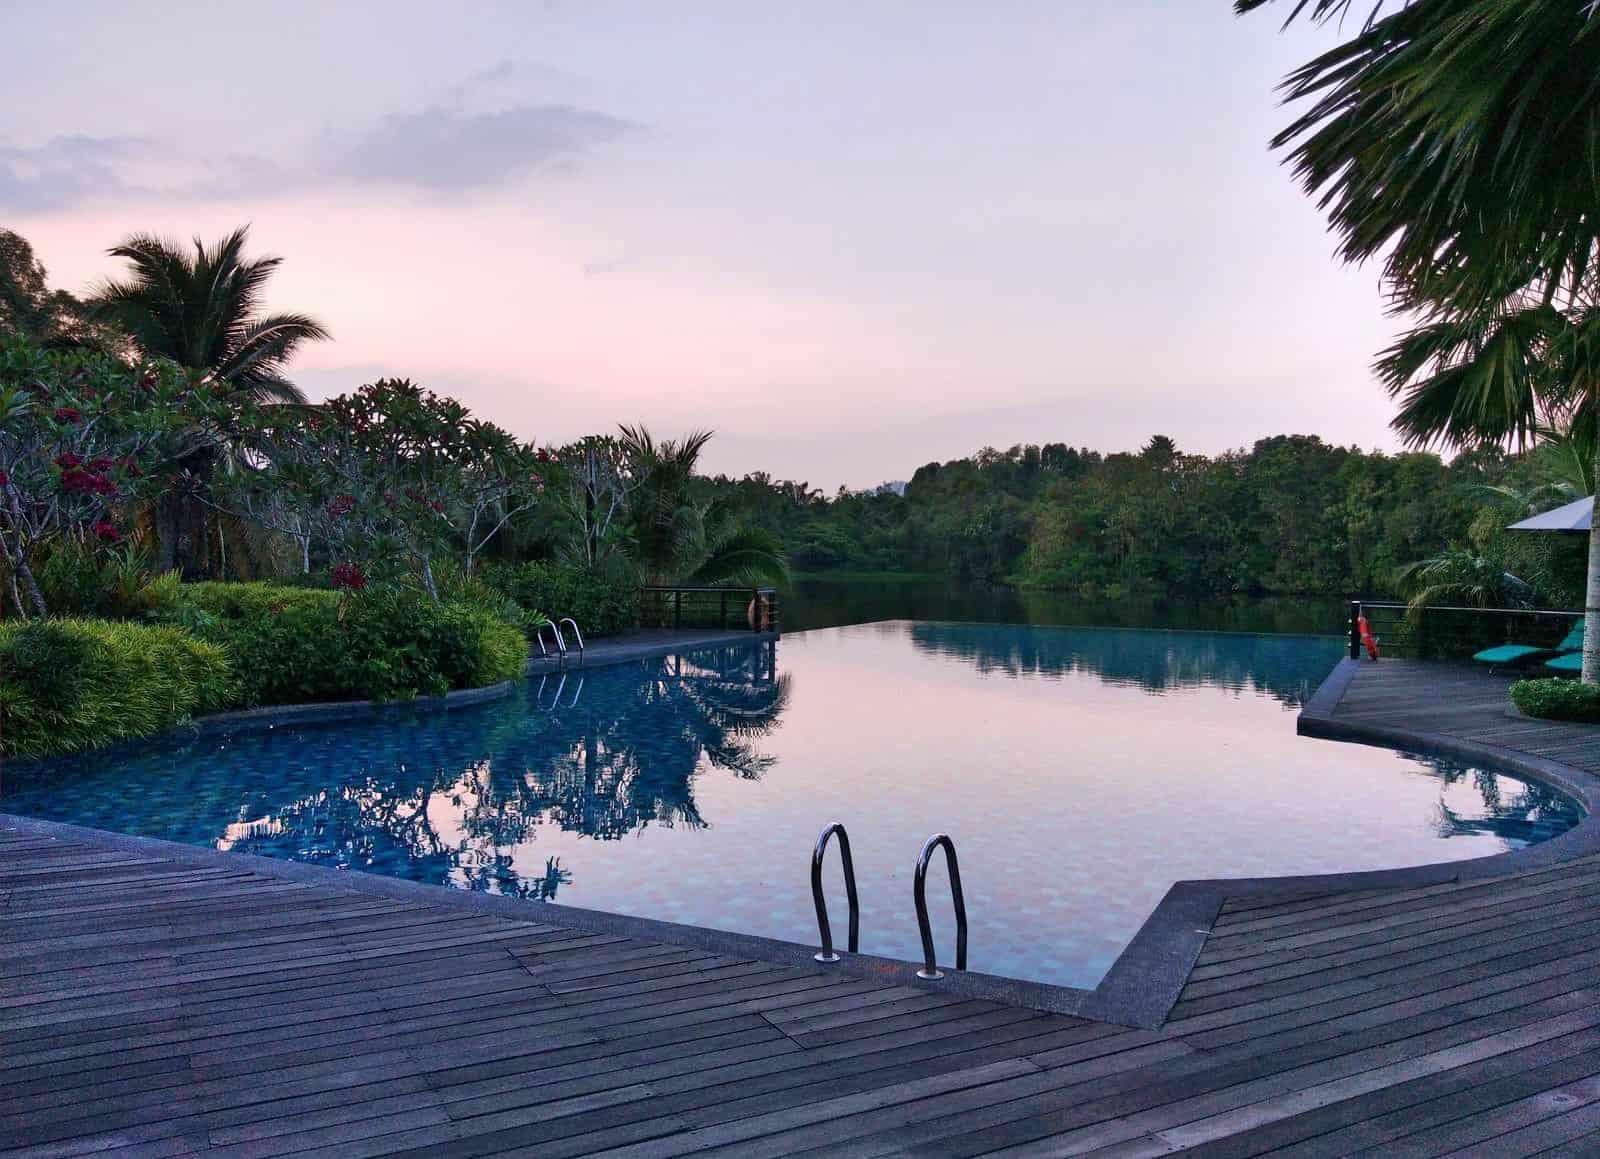 mangala-Resort-and-spa-gambang-malaysia-Travel-Mermaid-80